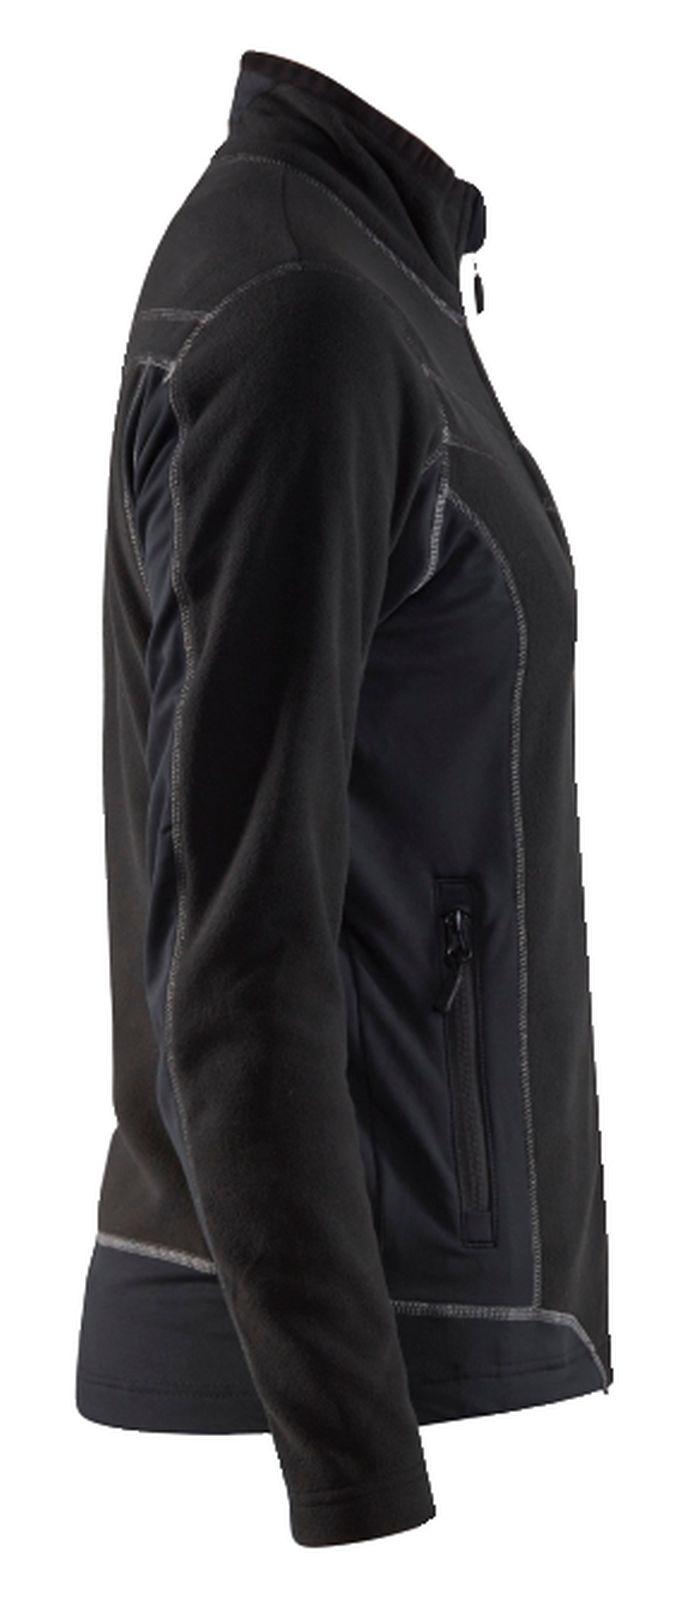 Blaklader Dames fleece vesten 49241010 zwart(9900)